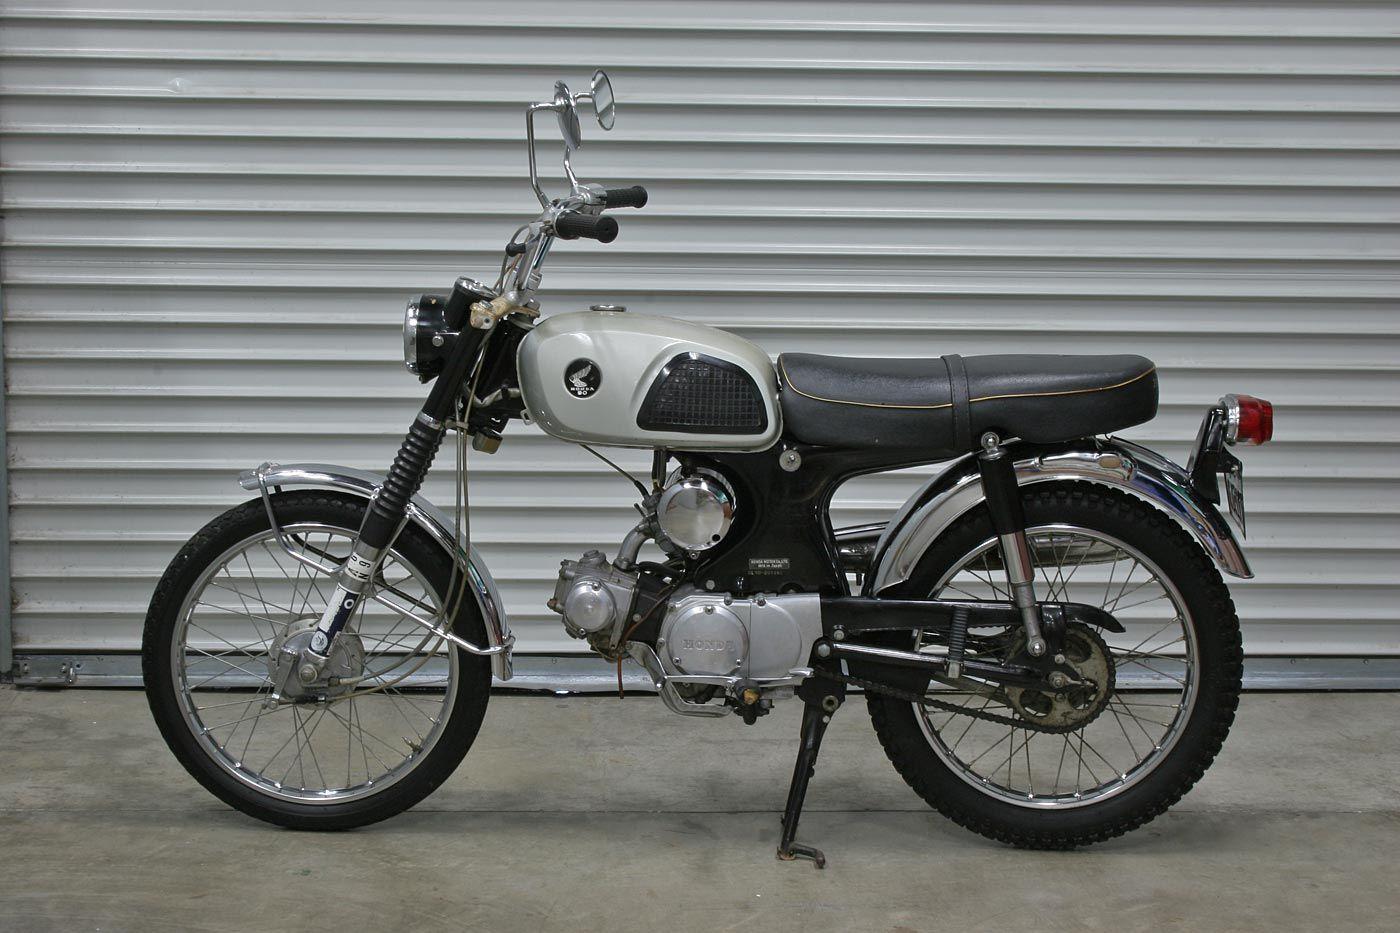 Sweet! 1967 Honda CL90 Motorcycle - Hughes Estate Sales: $5,000/OBO, One owner 1967 Honda CL90 Motorcycle with 2,809 original miles.